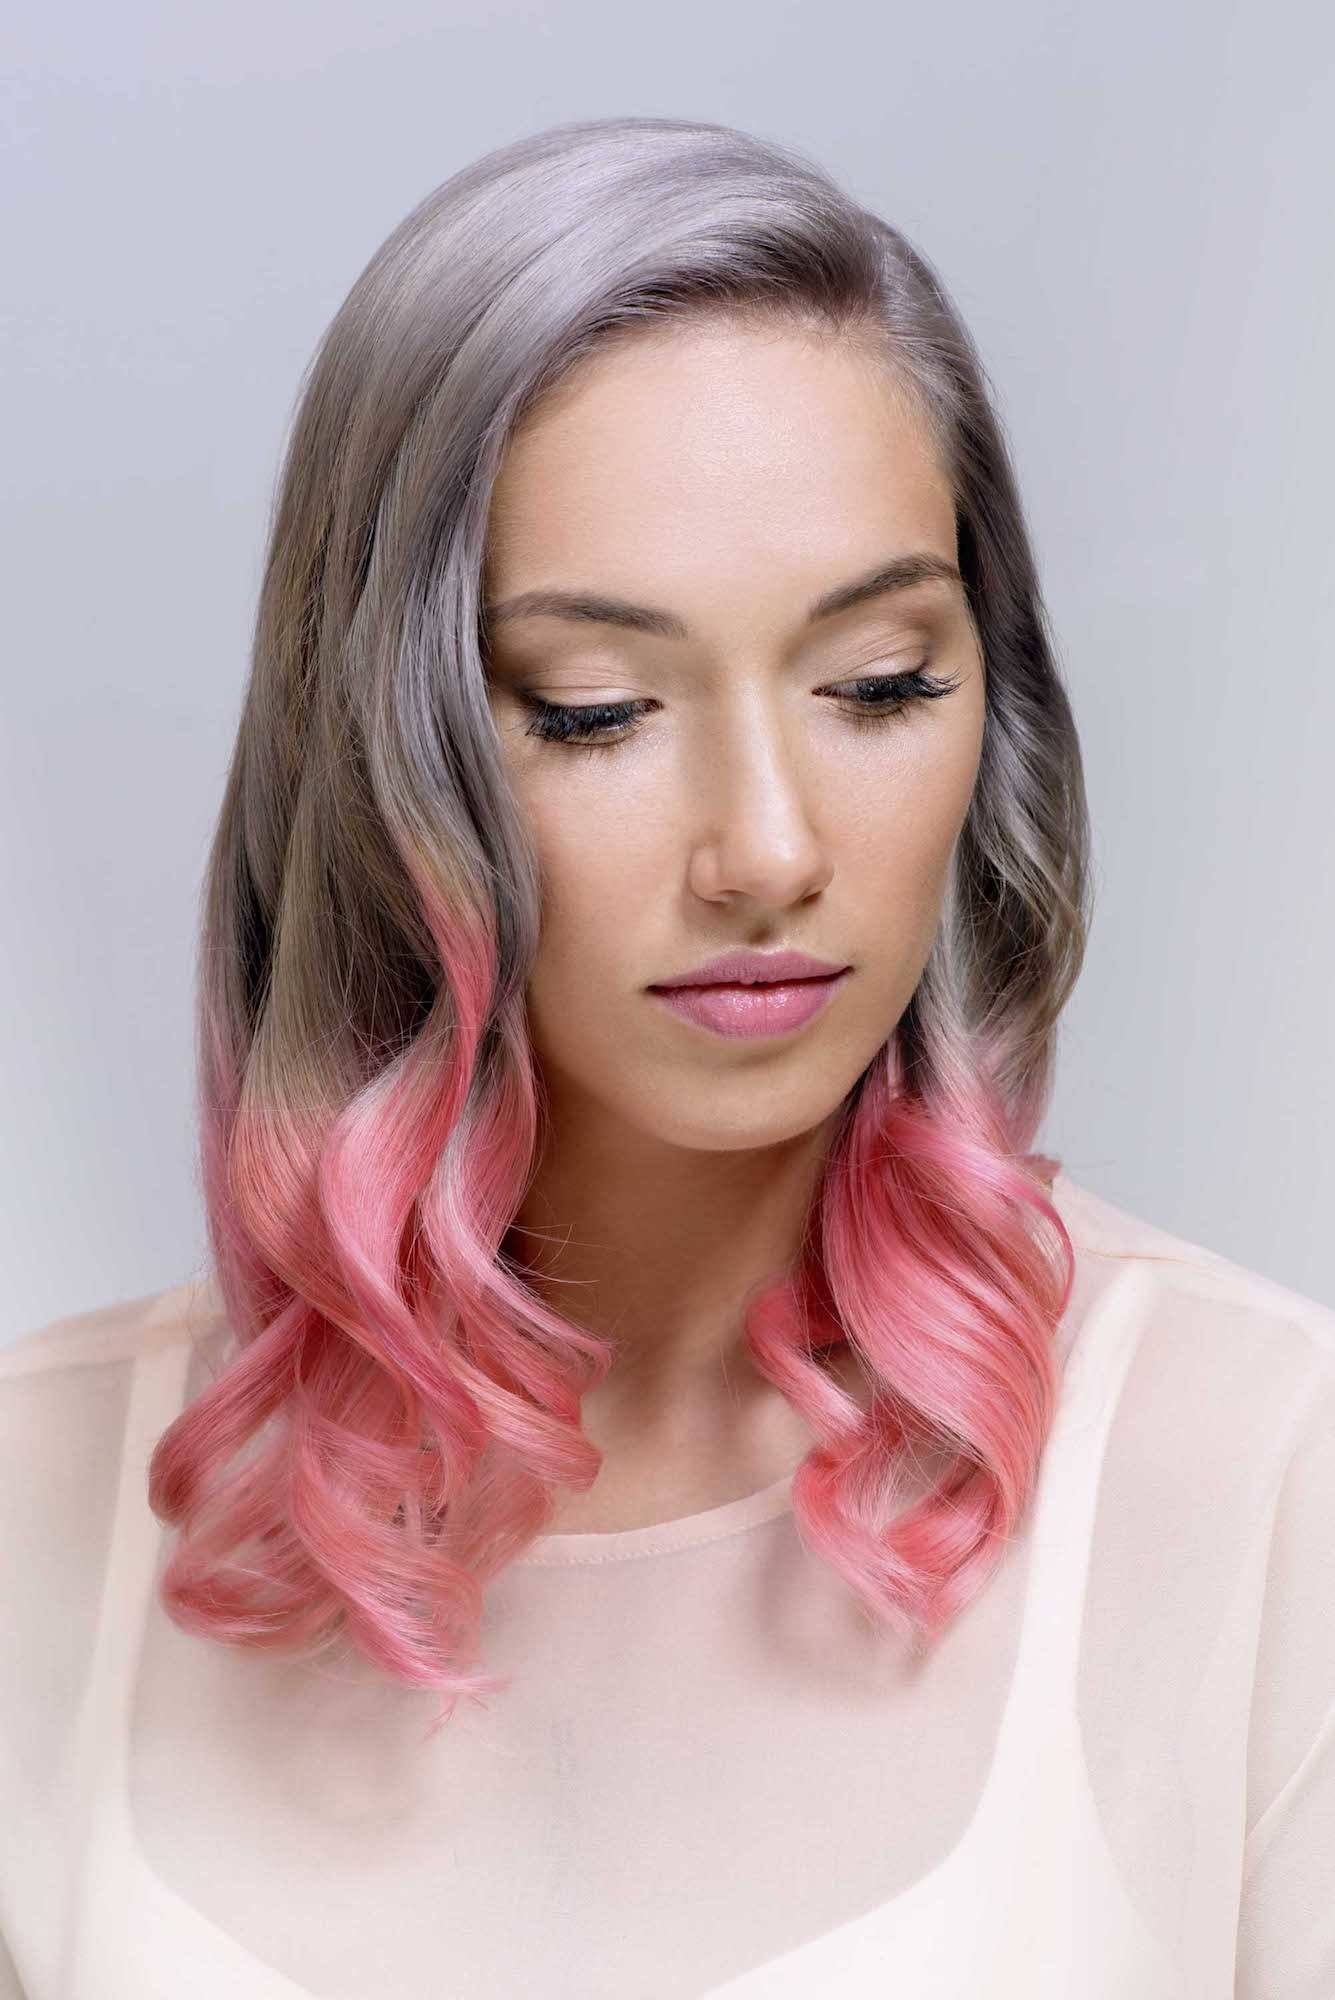 Wanita kaukasia dengan warna rambut ombre abu-abu dan pink pastel